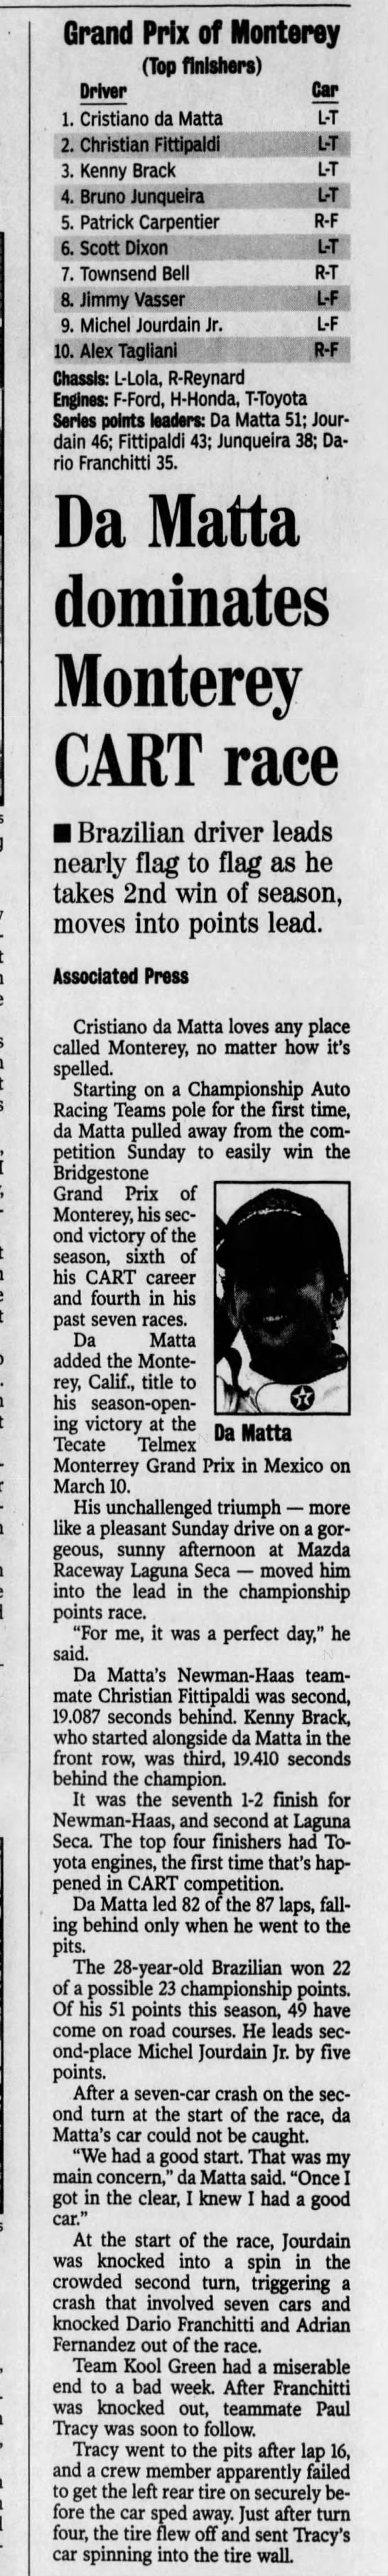 CART Laguna Seca 2002 -